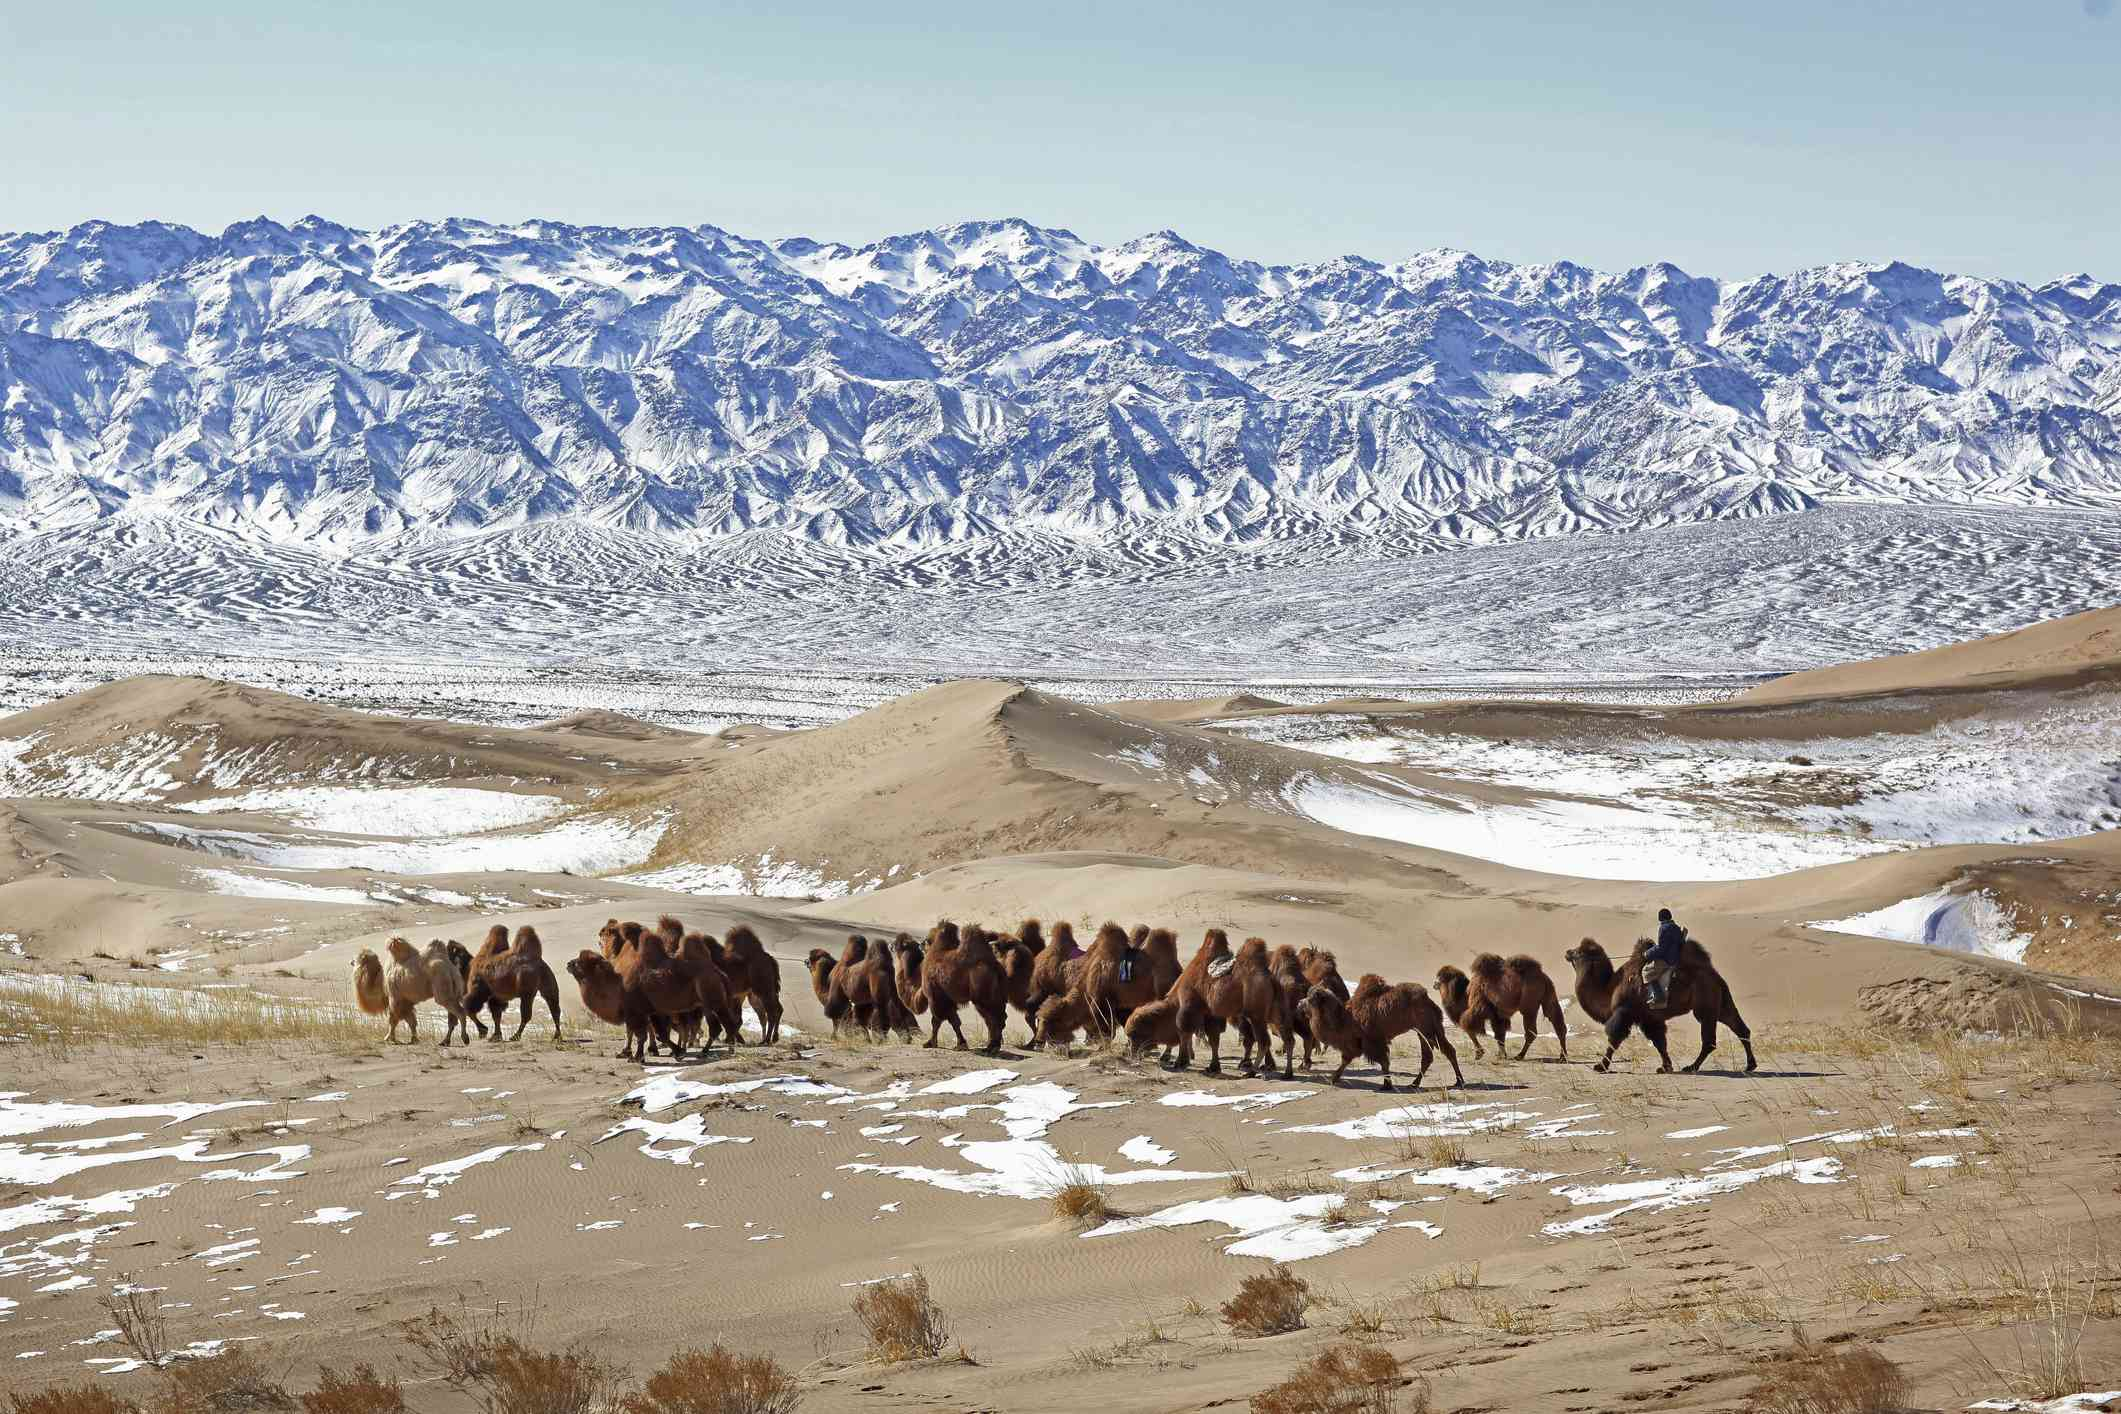 Nomad corrals a caravan of camels across snowy Gobi Desert